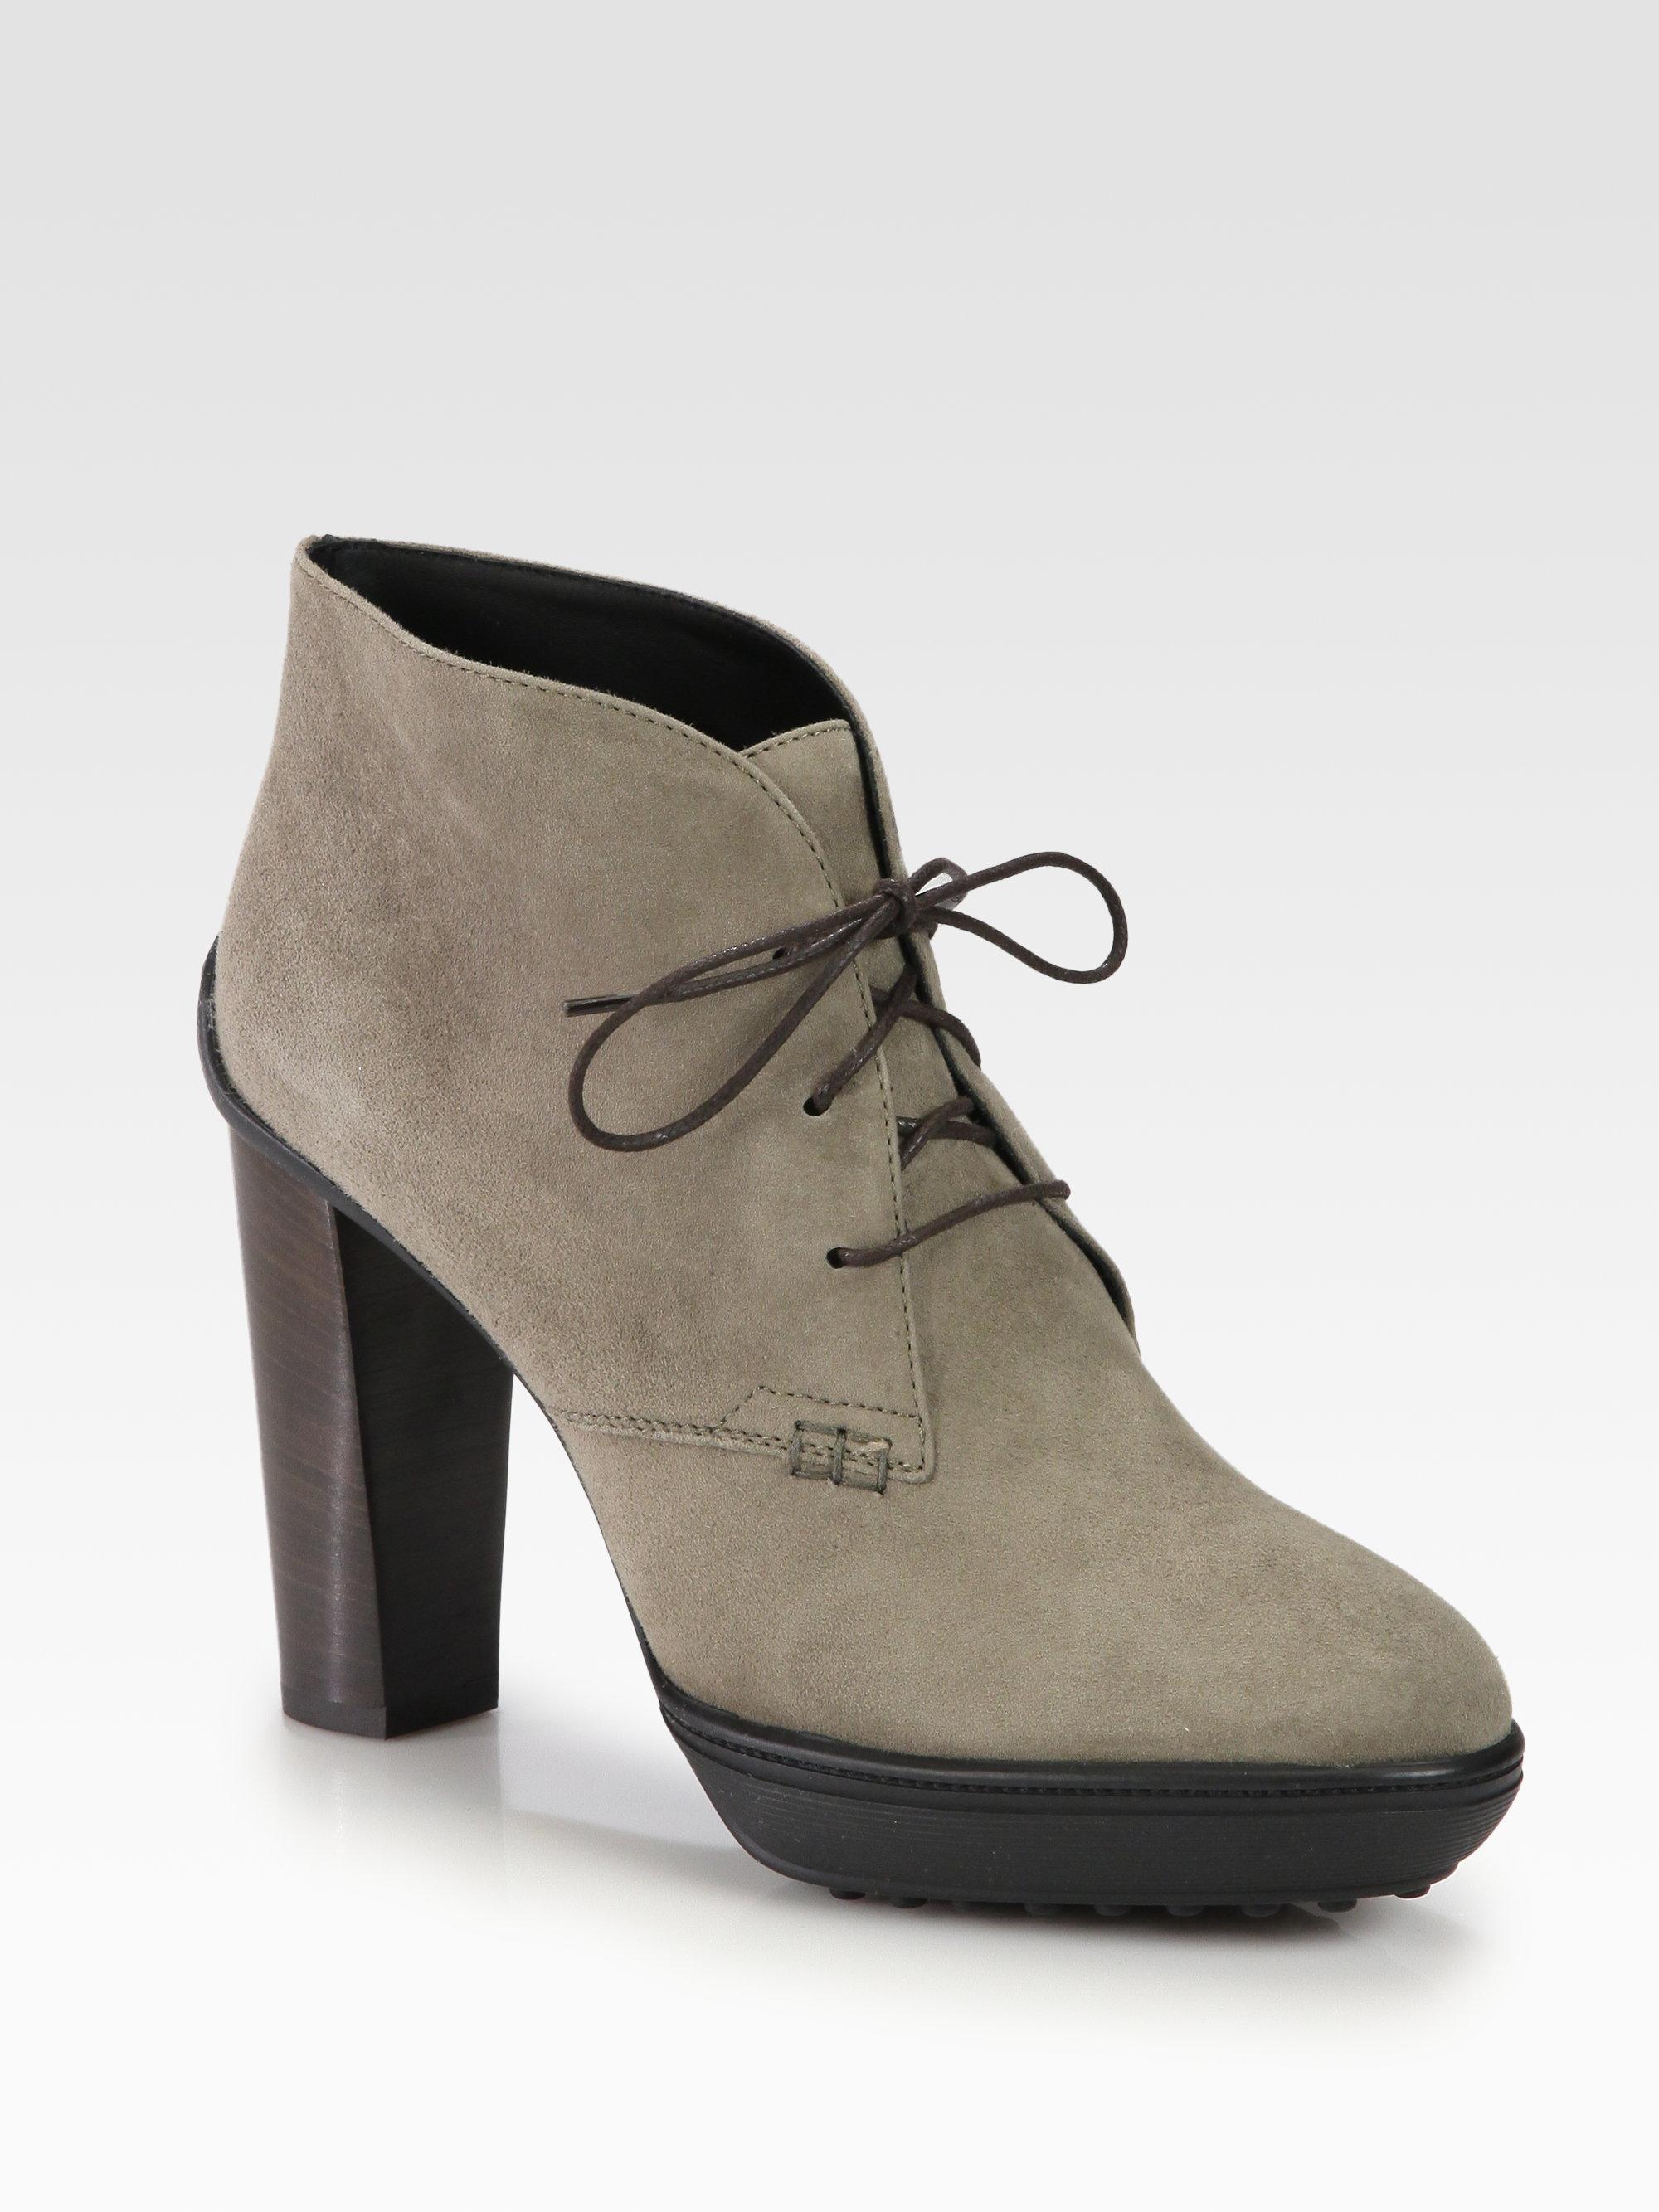 Tod's Lace-Up Platform Boots sale wholesale price zjeBjBX7H7